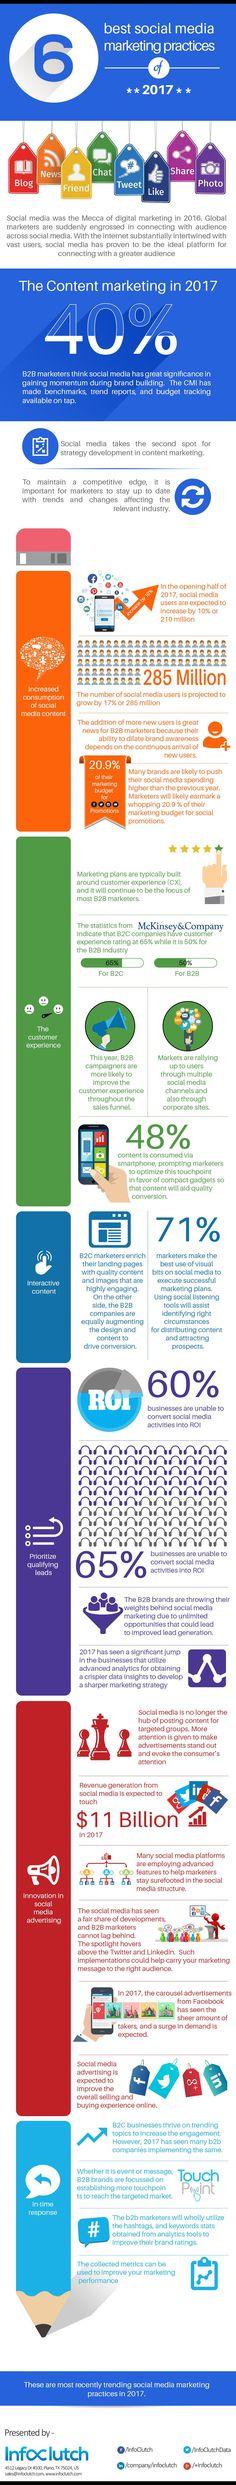 6 Best Social Media Marketing Practices Of 2017 #Infographic #Marketing #SocialMedia